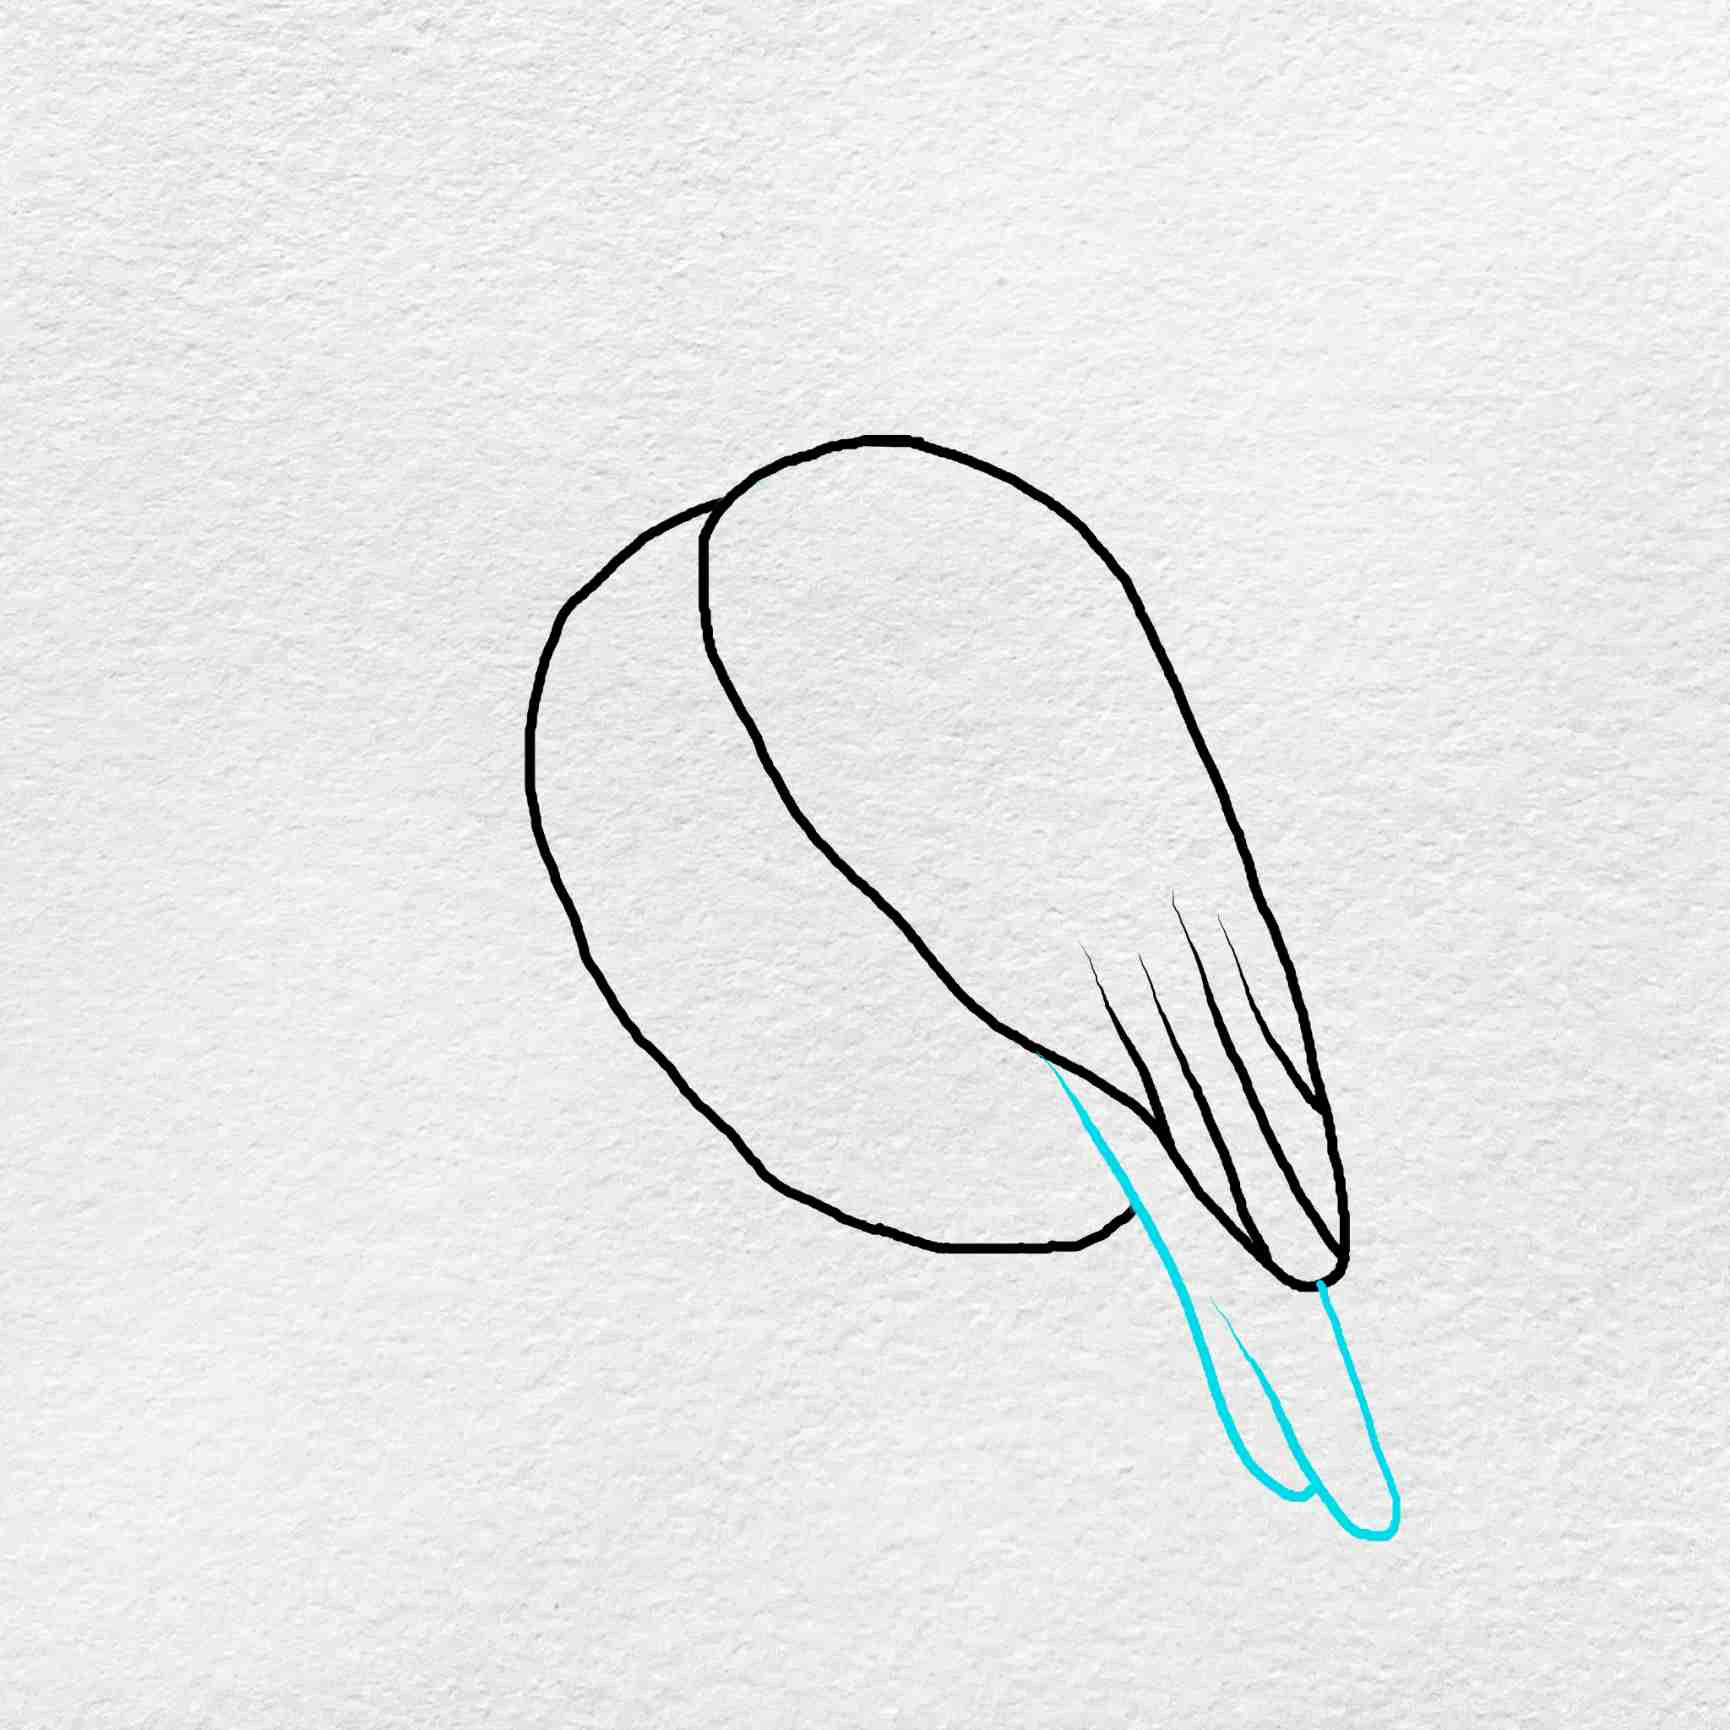 Snowy Owl Drawing: Step 3